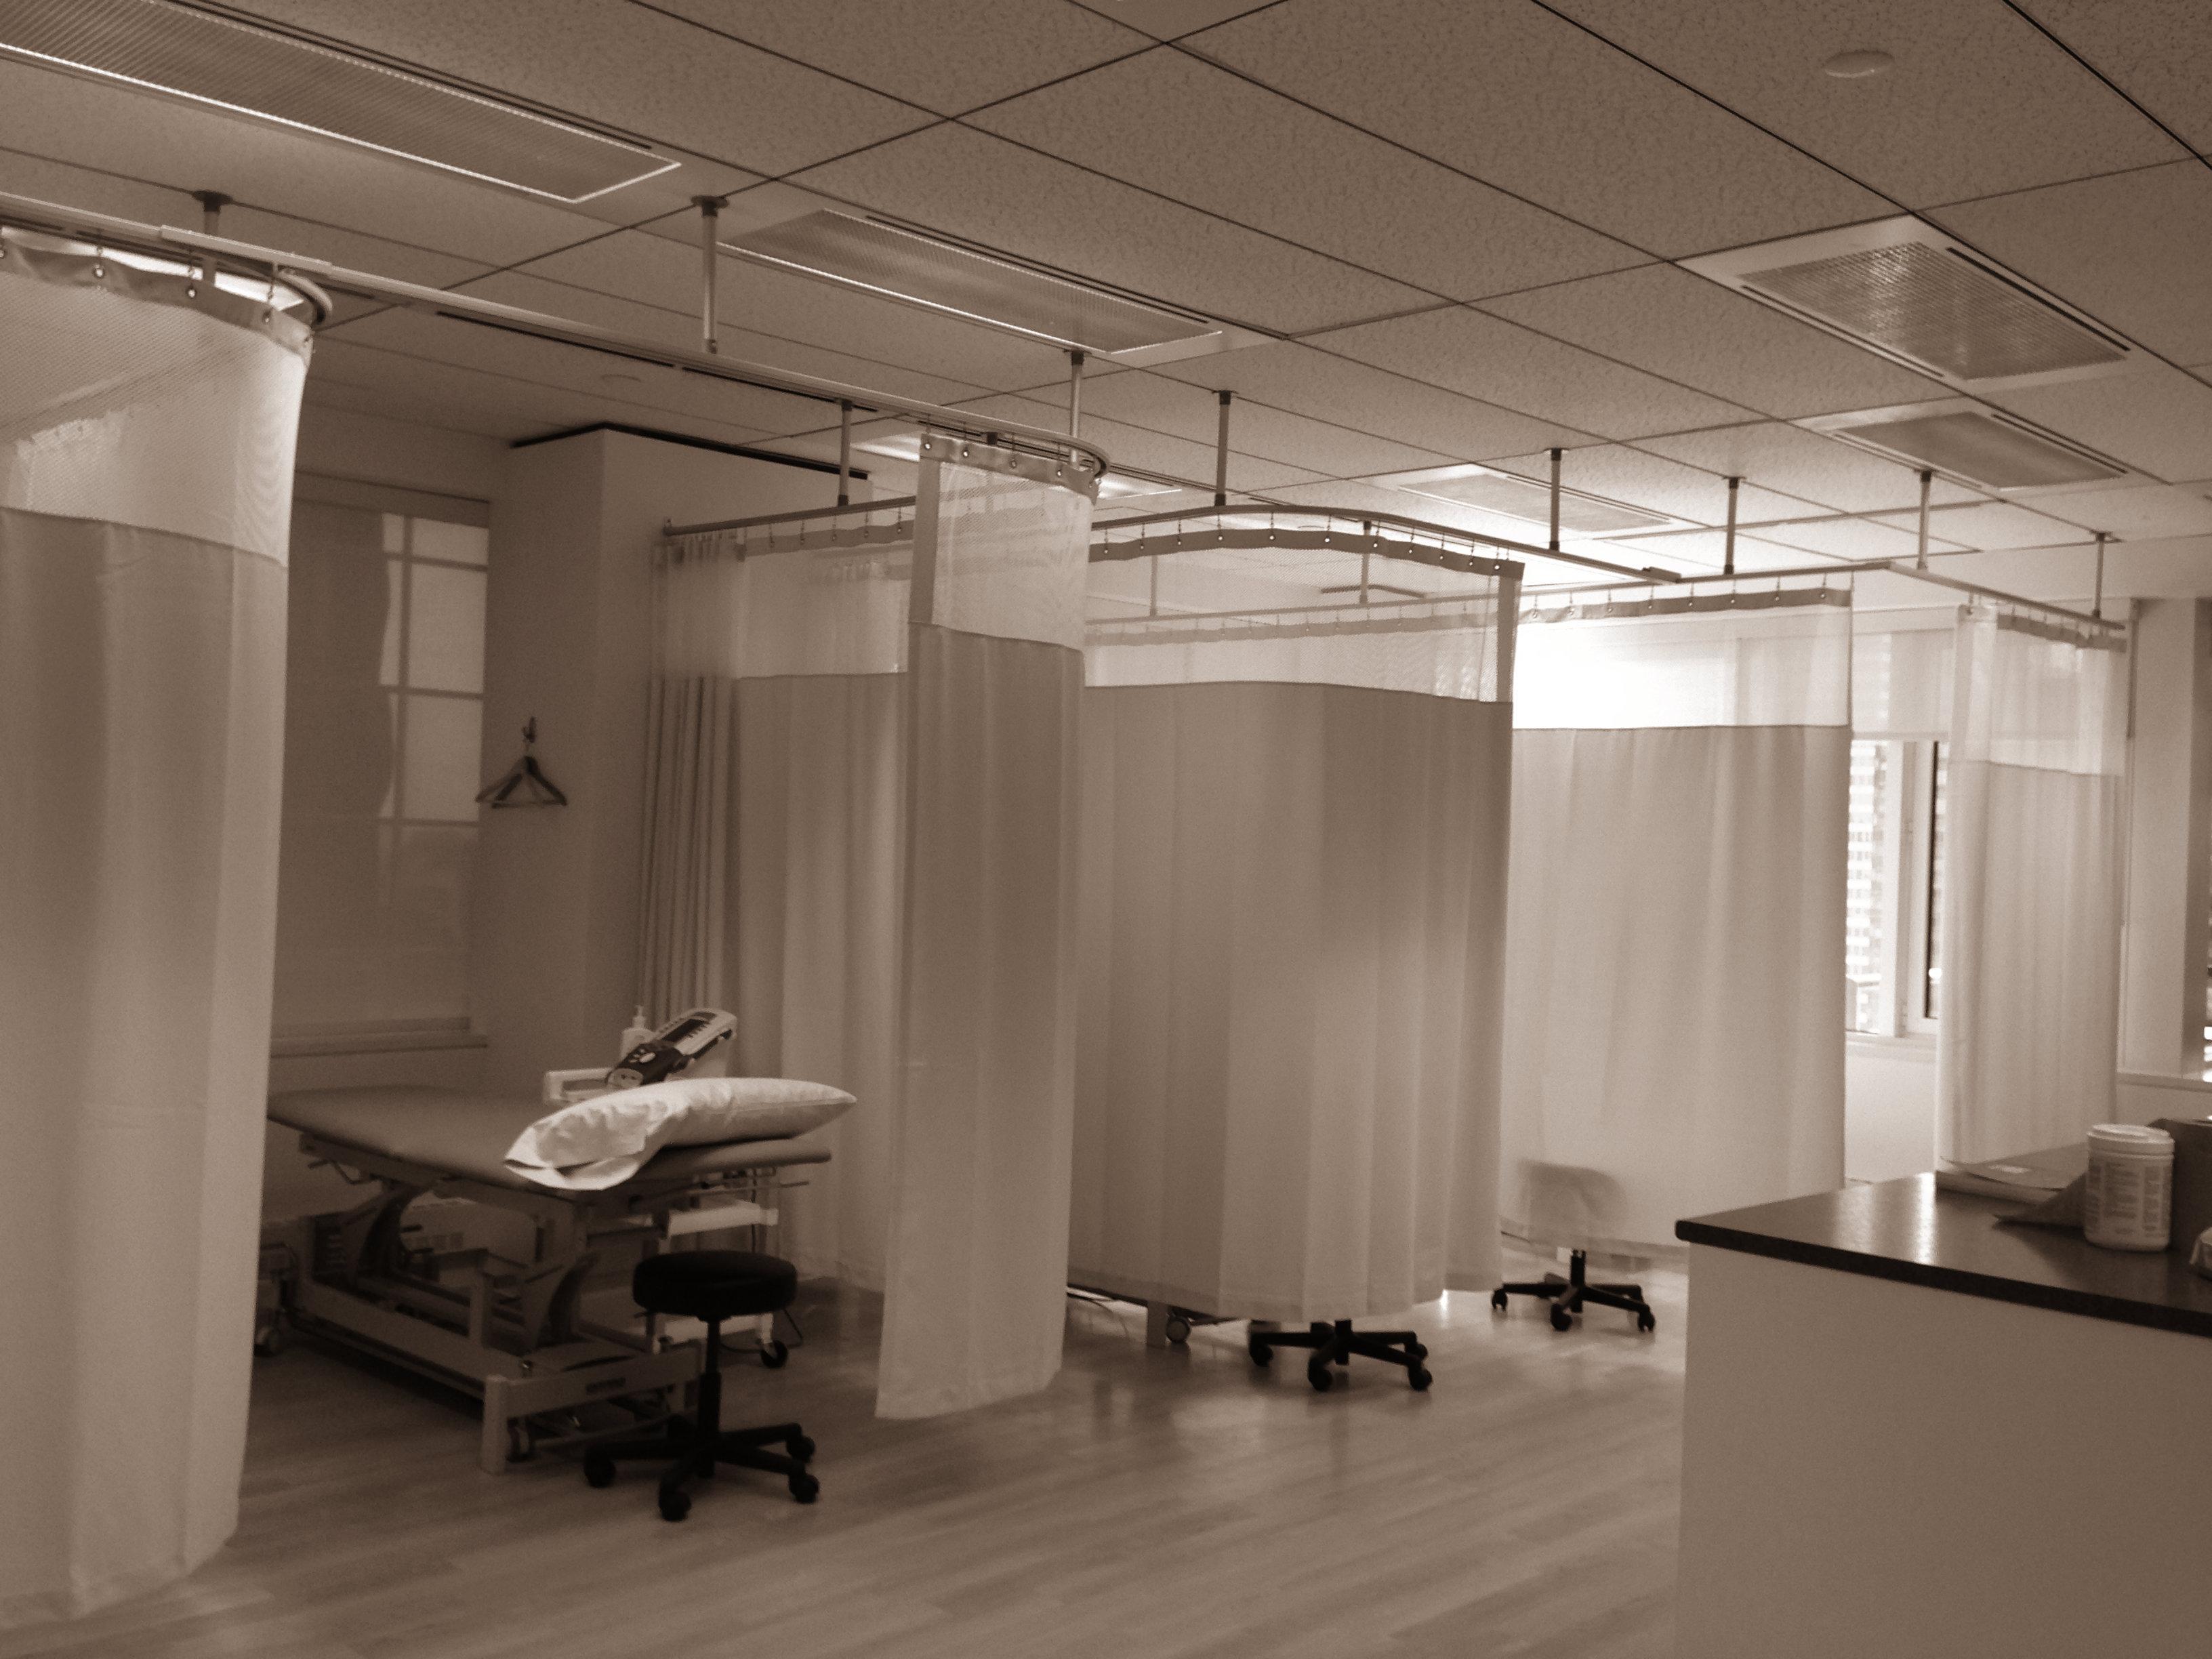 9 Scary Hospital Stories As Told By Nurses Nursebuff